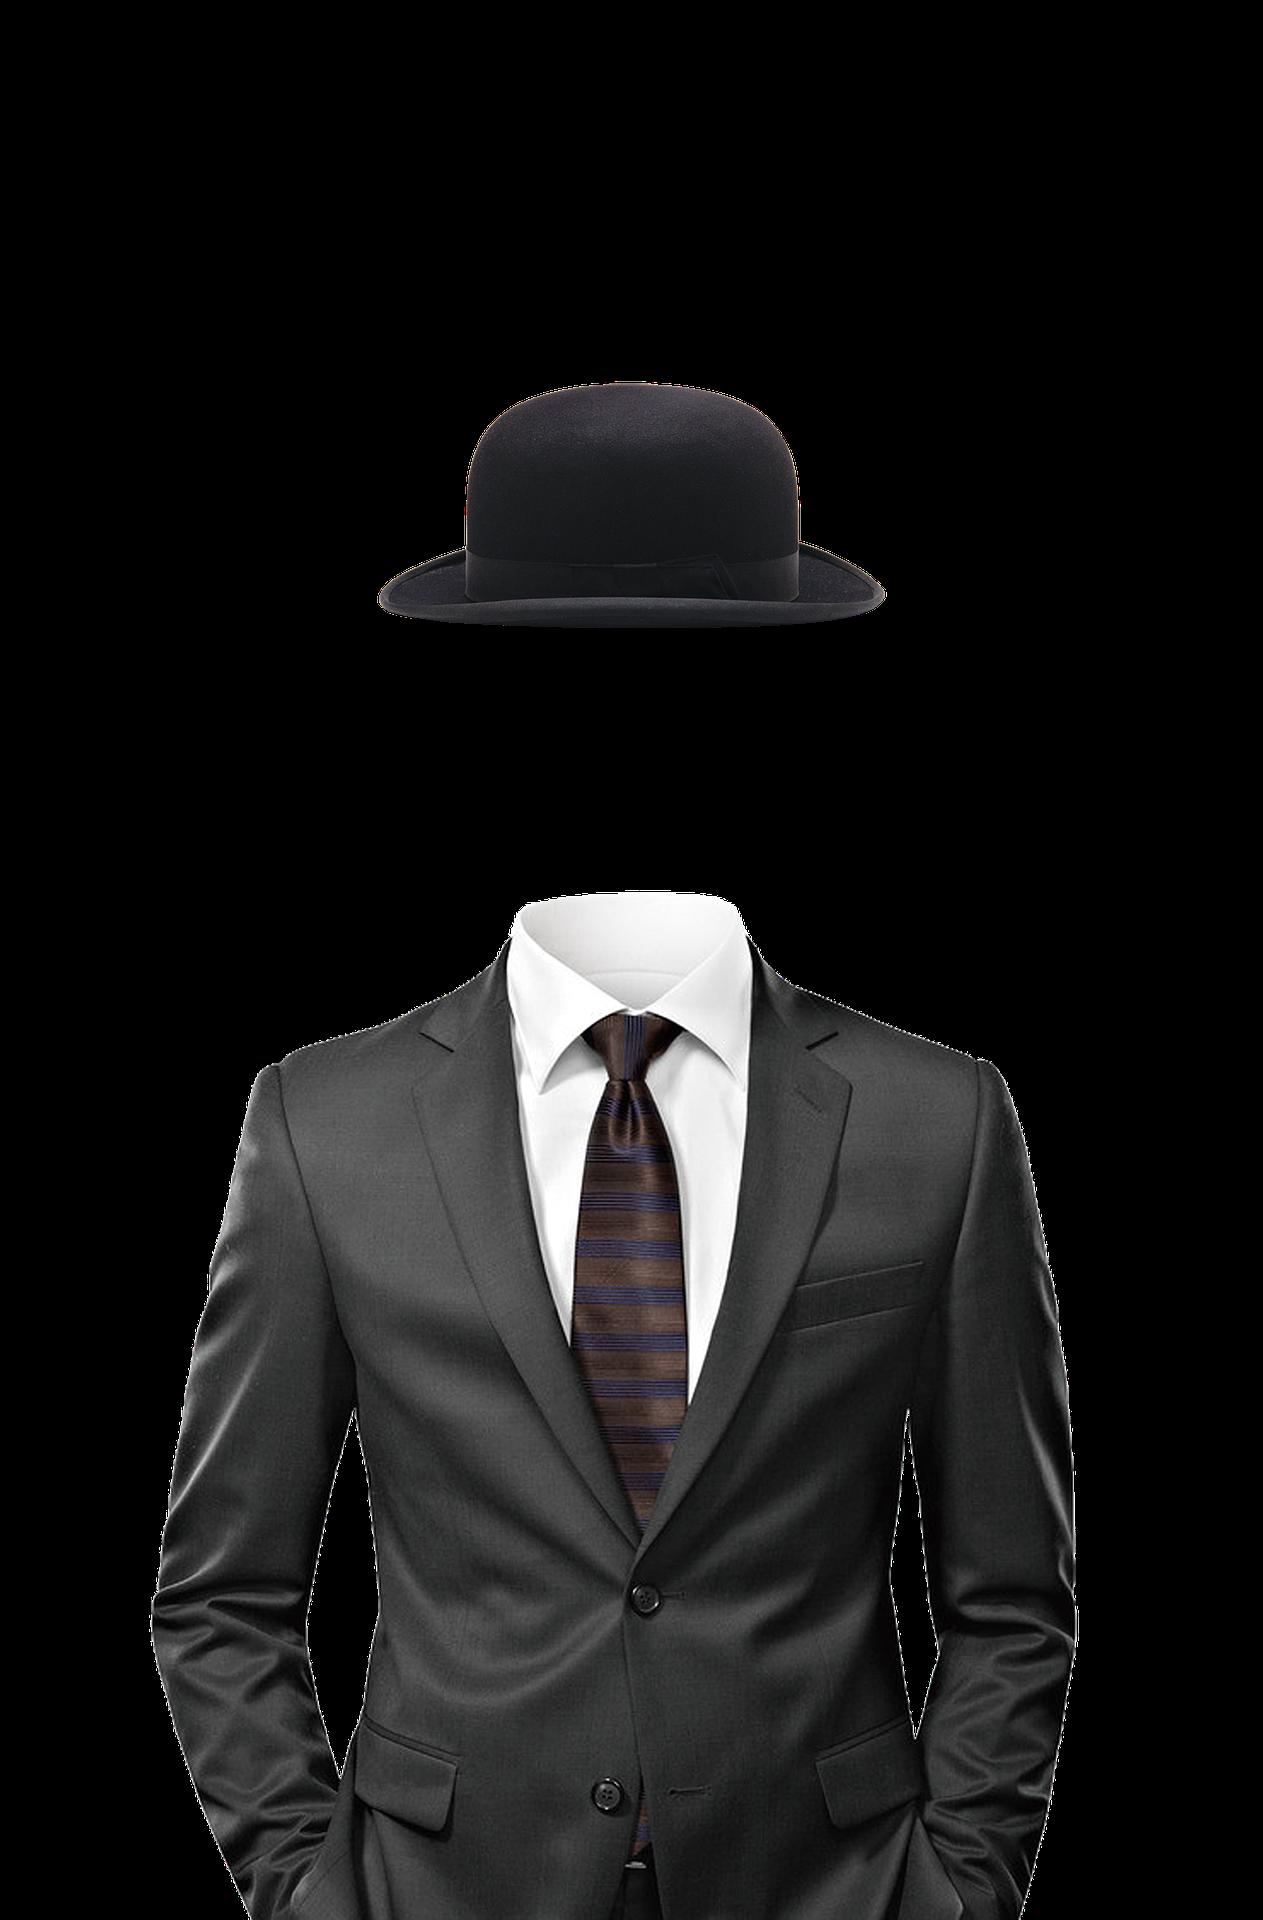 Brad Kroenig Fronts Brothers Spring Summer 2013 Campaign Black Suit Men All Black Suit Black Suit Wedding